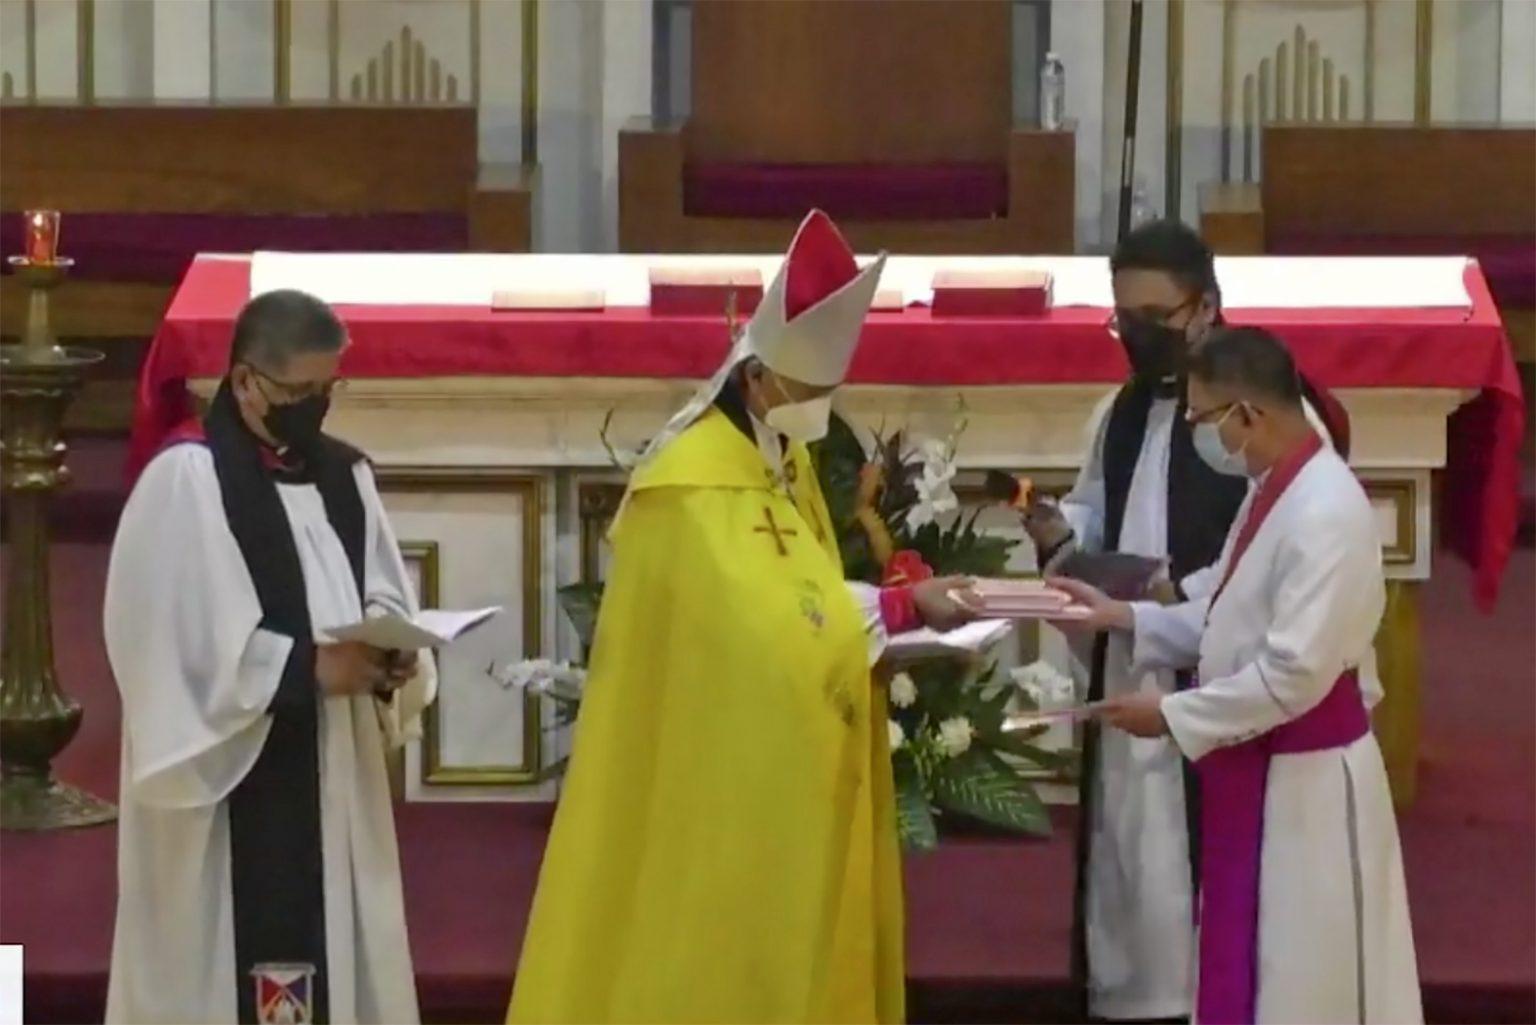 Catholic, IFI churches move towards reconciliation